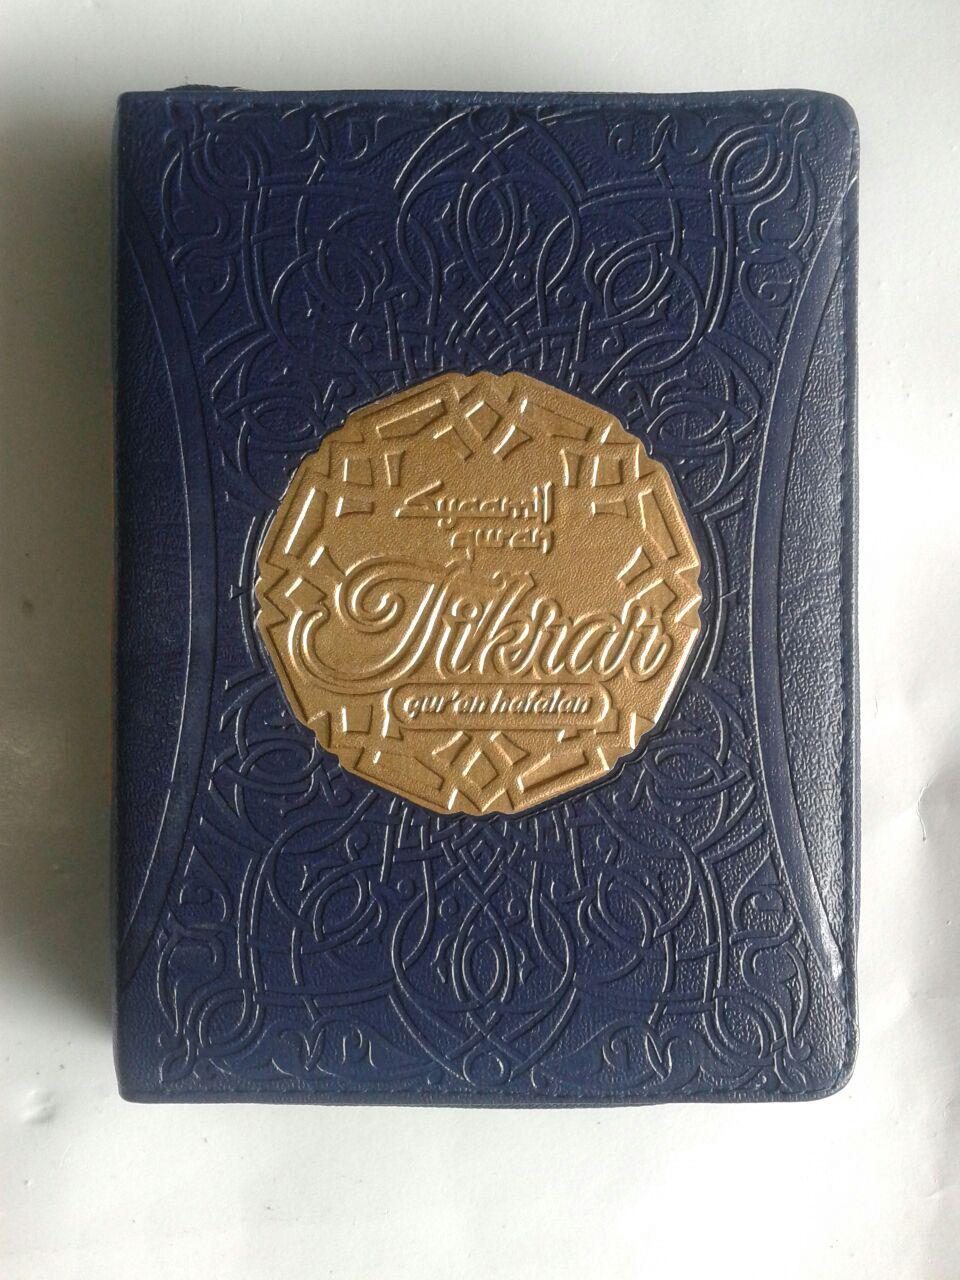 Qur'an Hafalan Tikrar Ukuran B6 Resleting cover